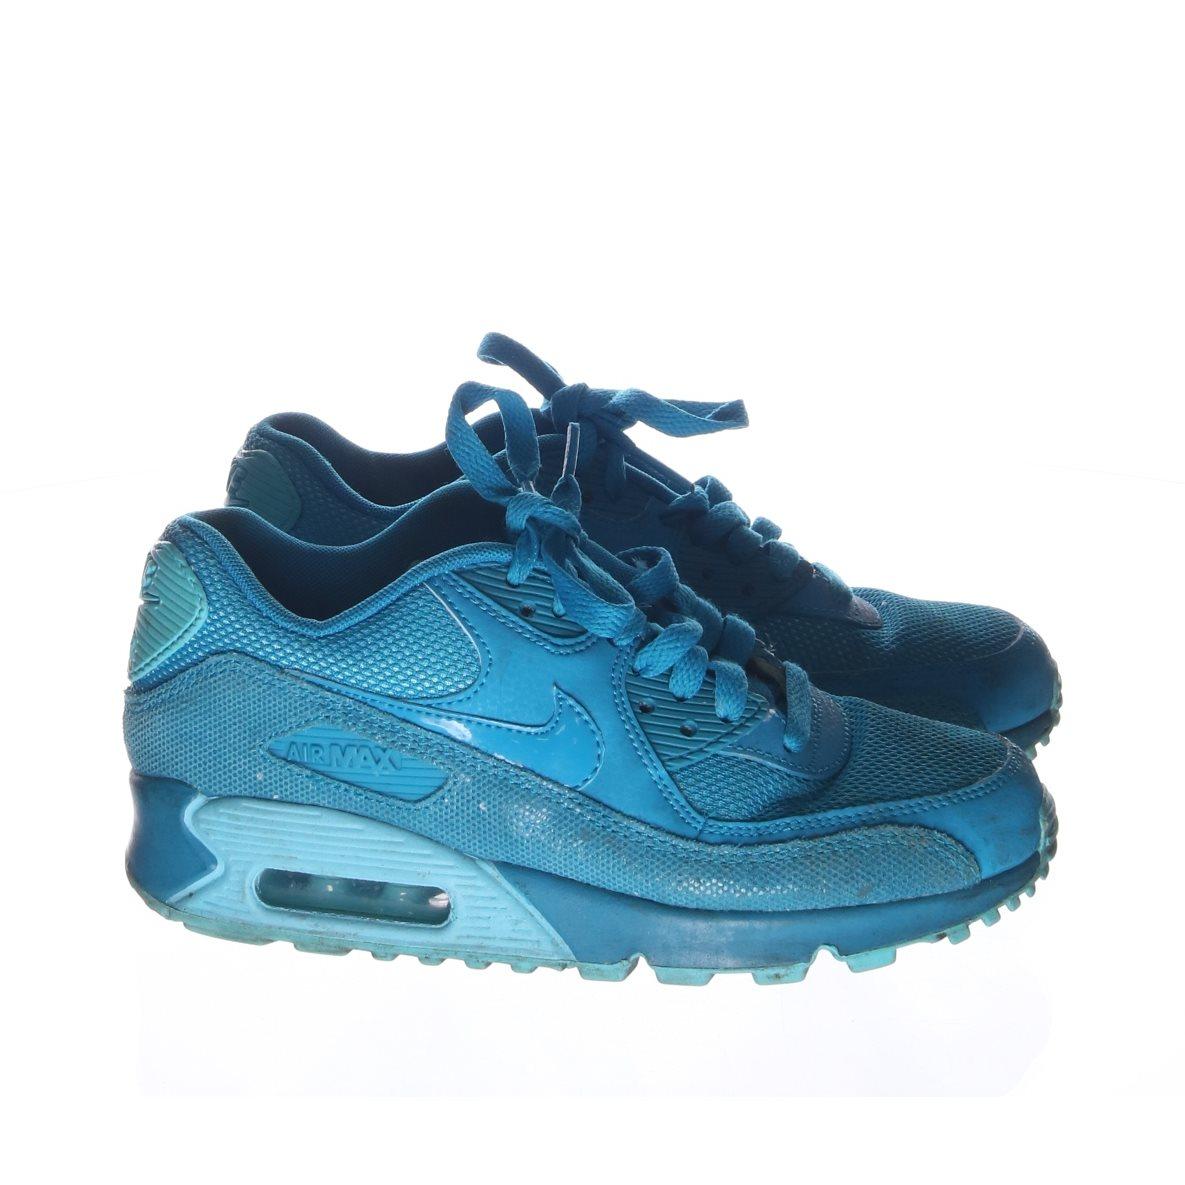 super popular 4fa83 8b80a Nike Herr Sportkläder Skor Blå Lagoon,nike skor billigt billiga,bekväm,nike  skor blå